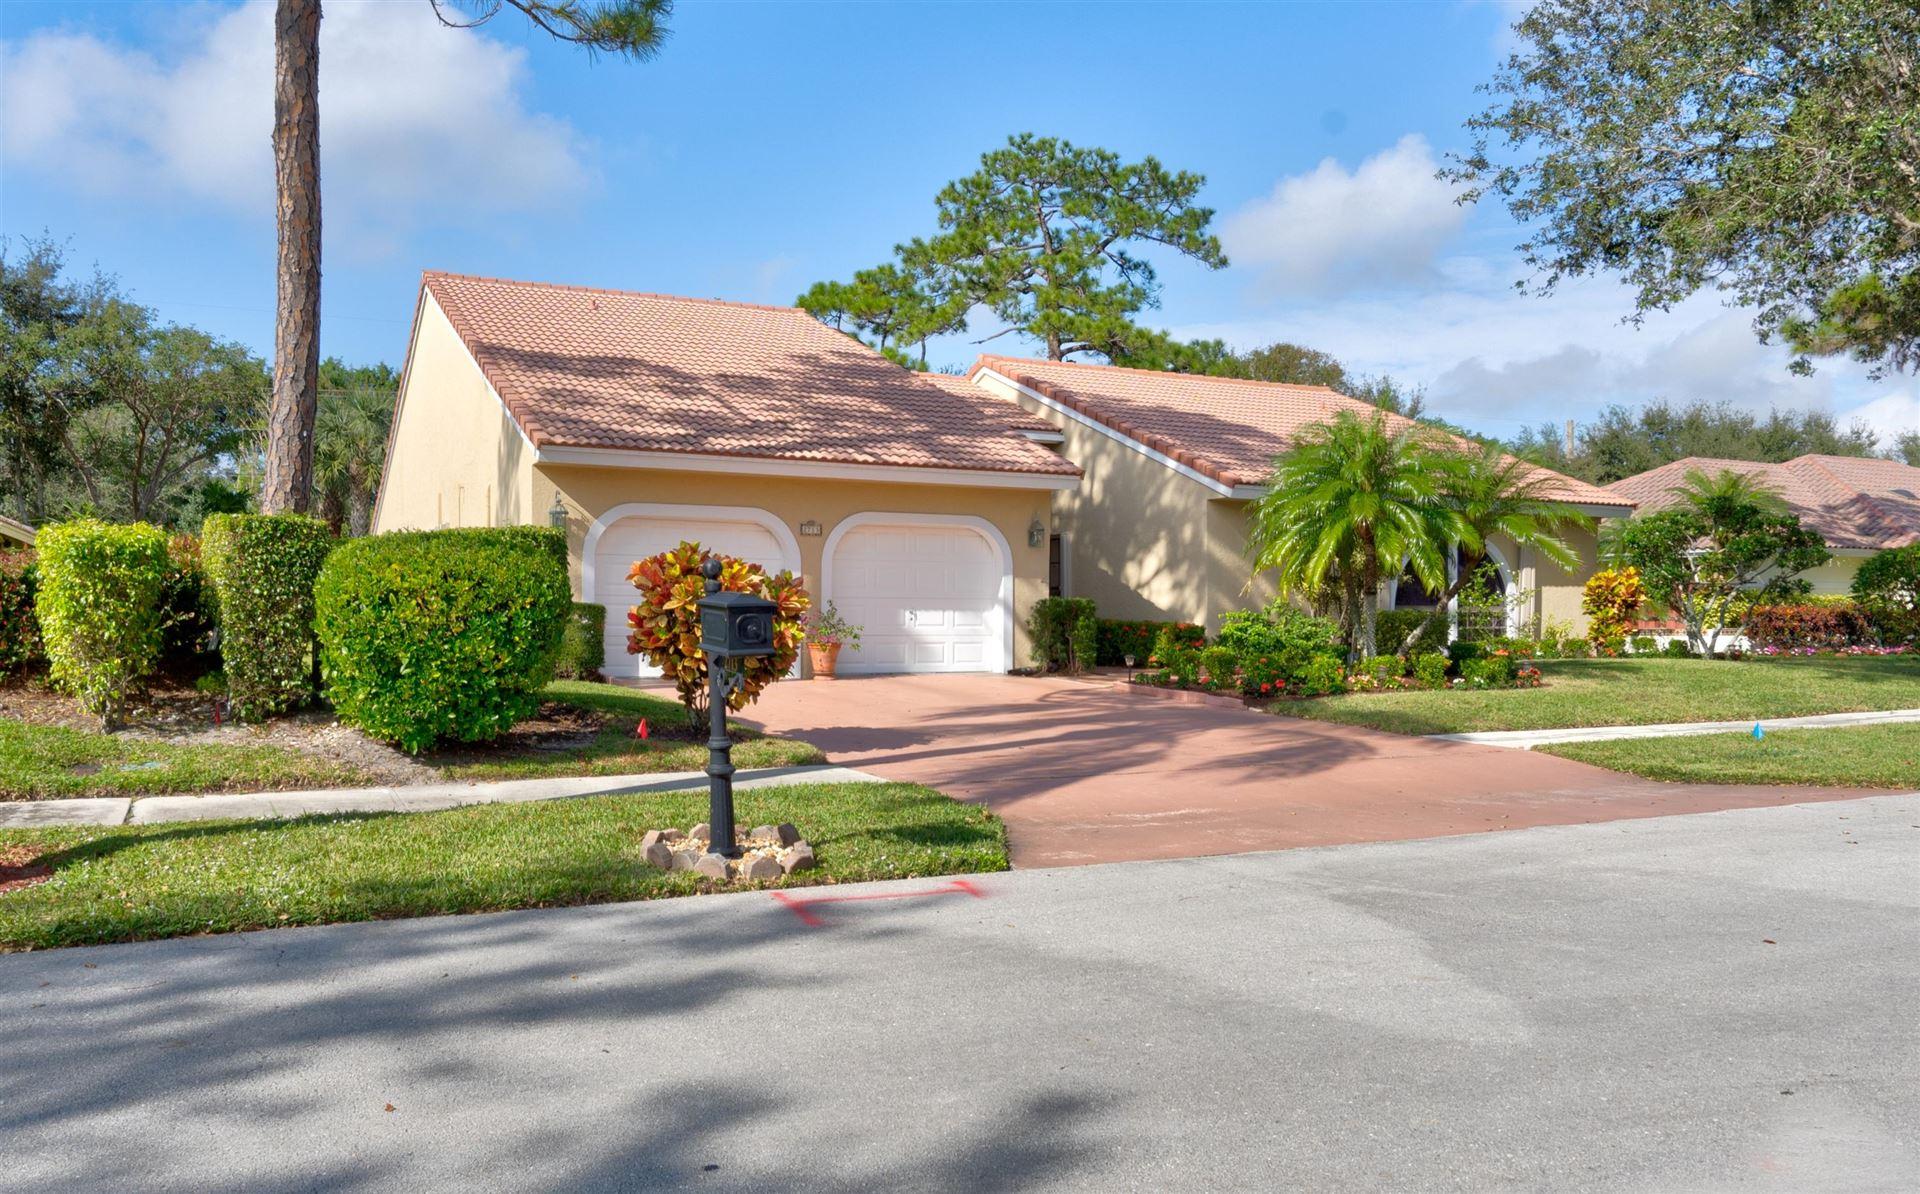 2713 NW 29th Avenue NW, Boca Raton, FL 33434 - #: RX-10677674